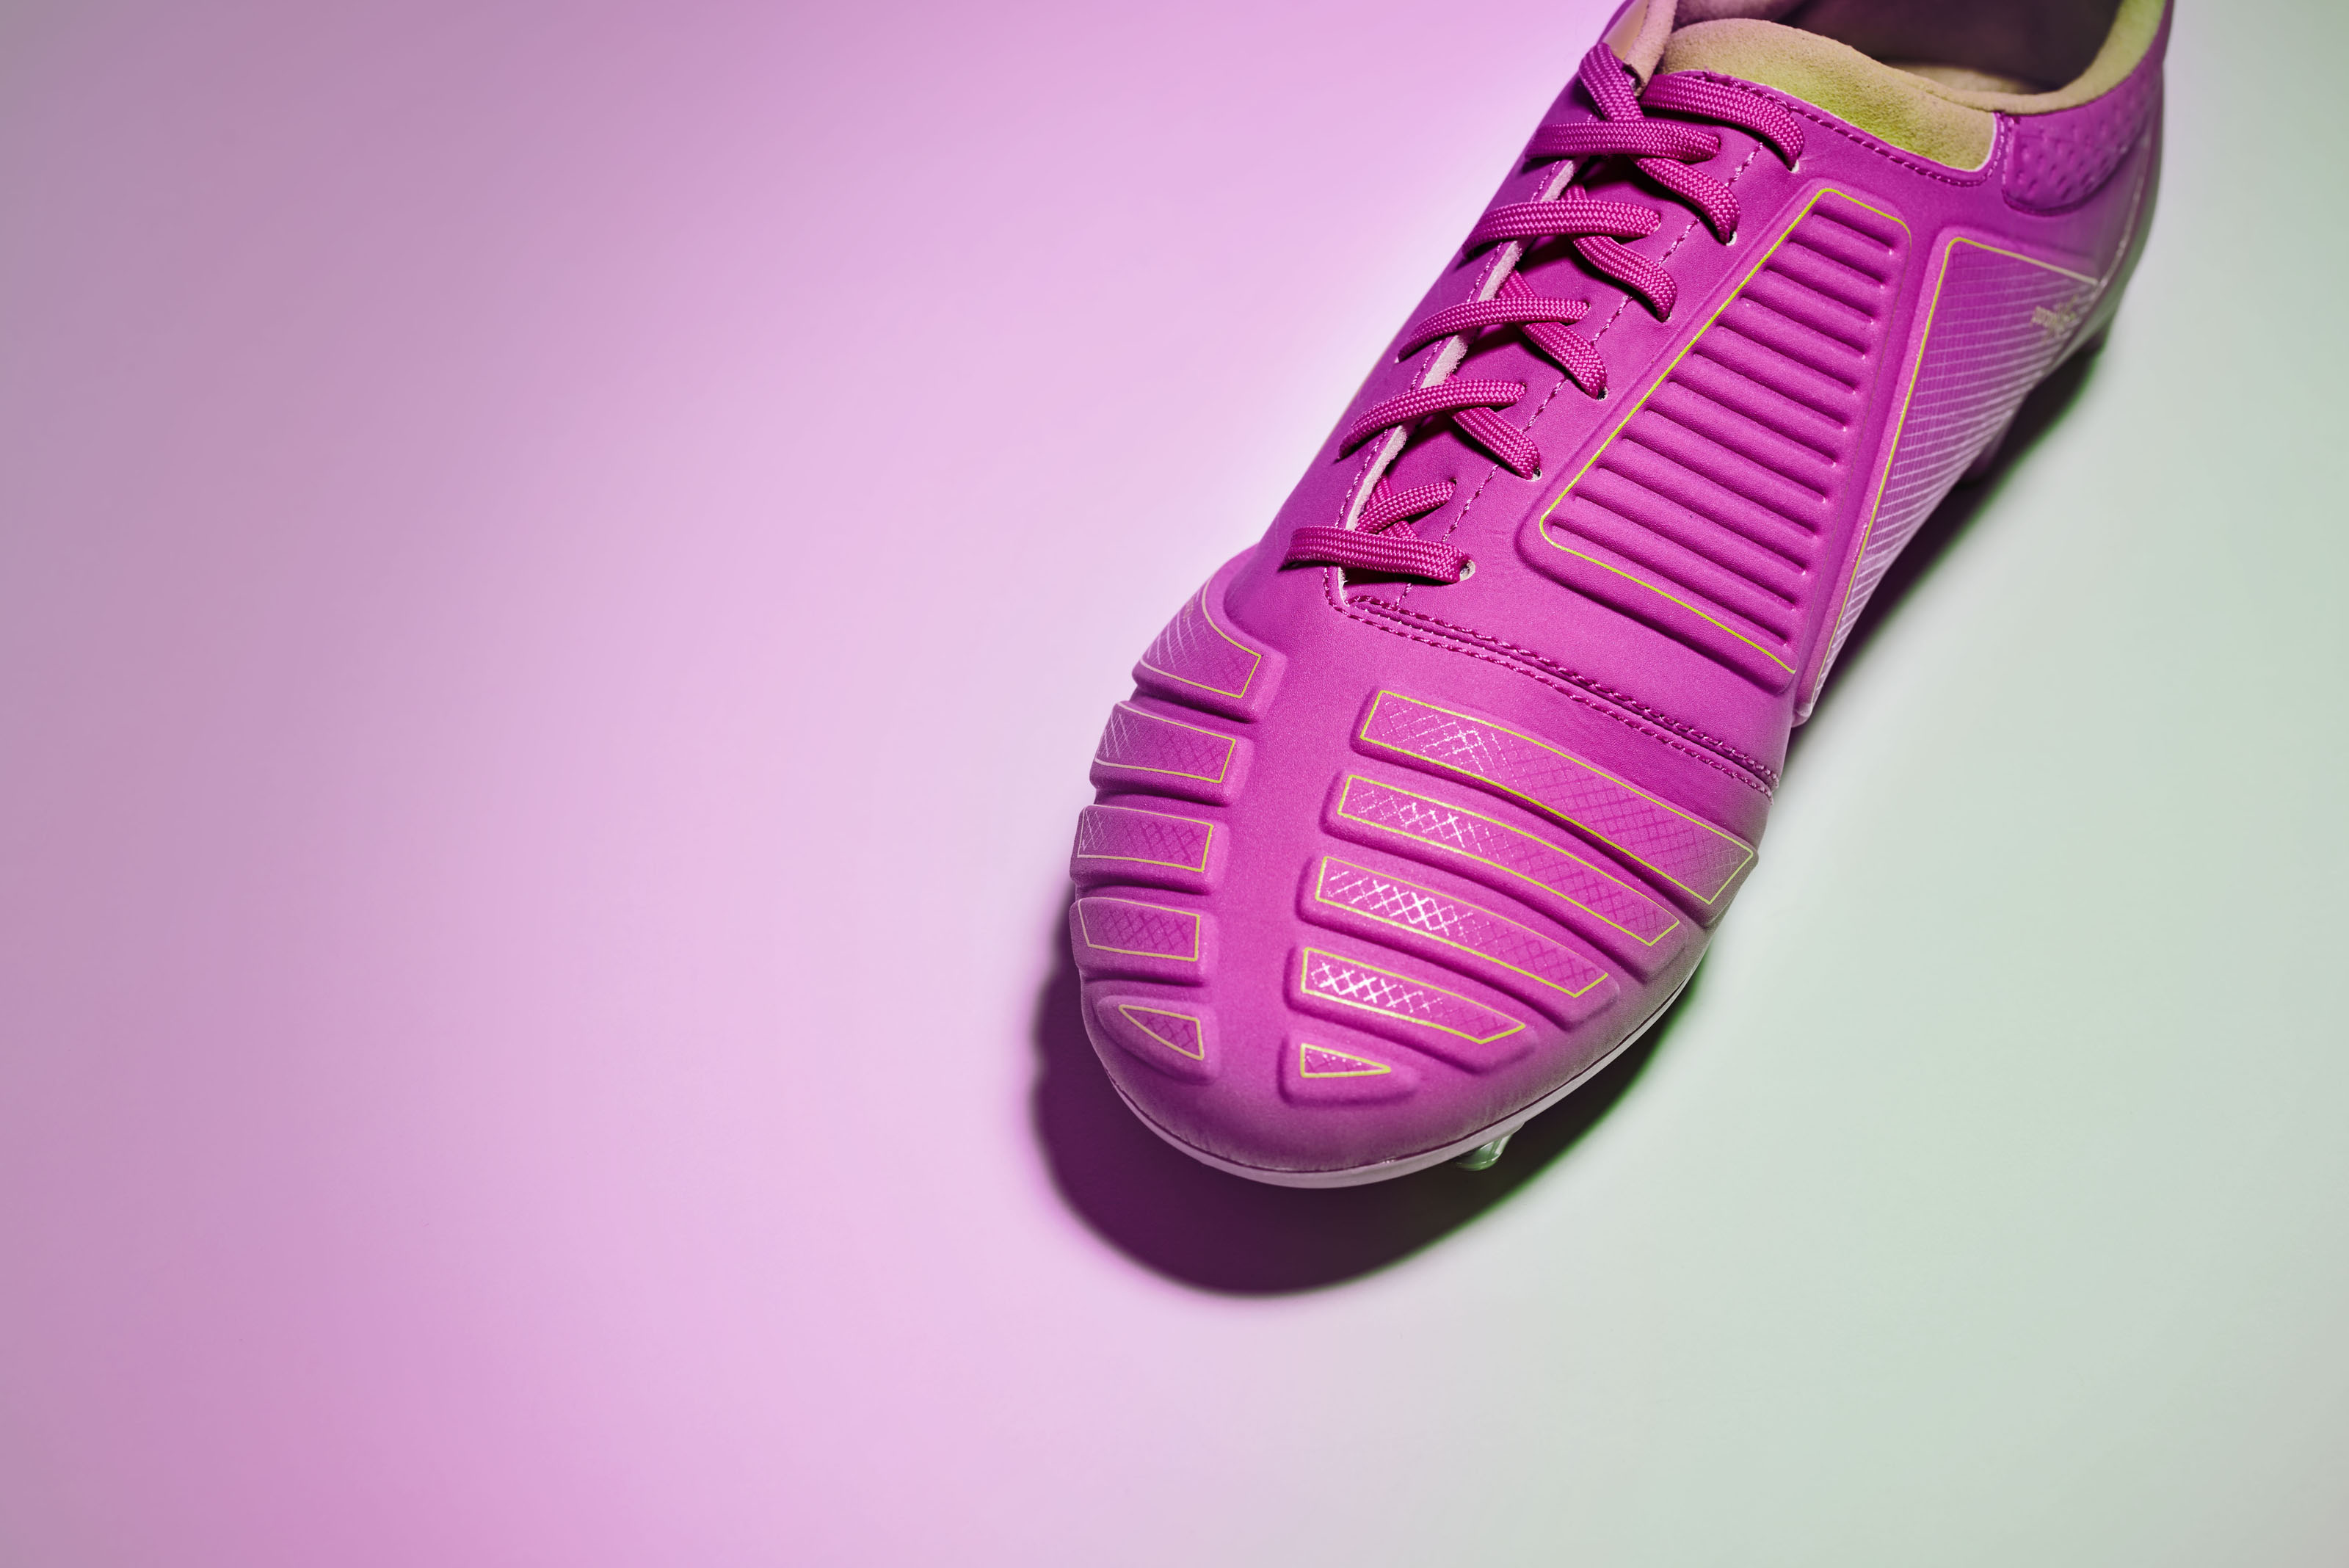 ms_umbro_aw16_accuro_purple_colour_001